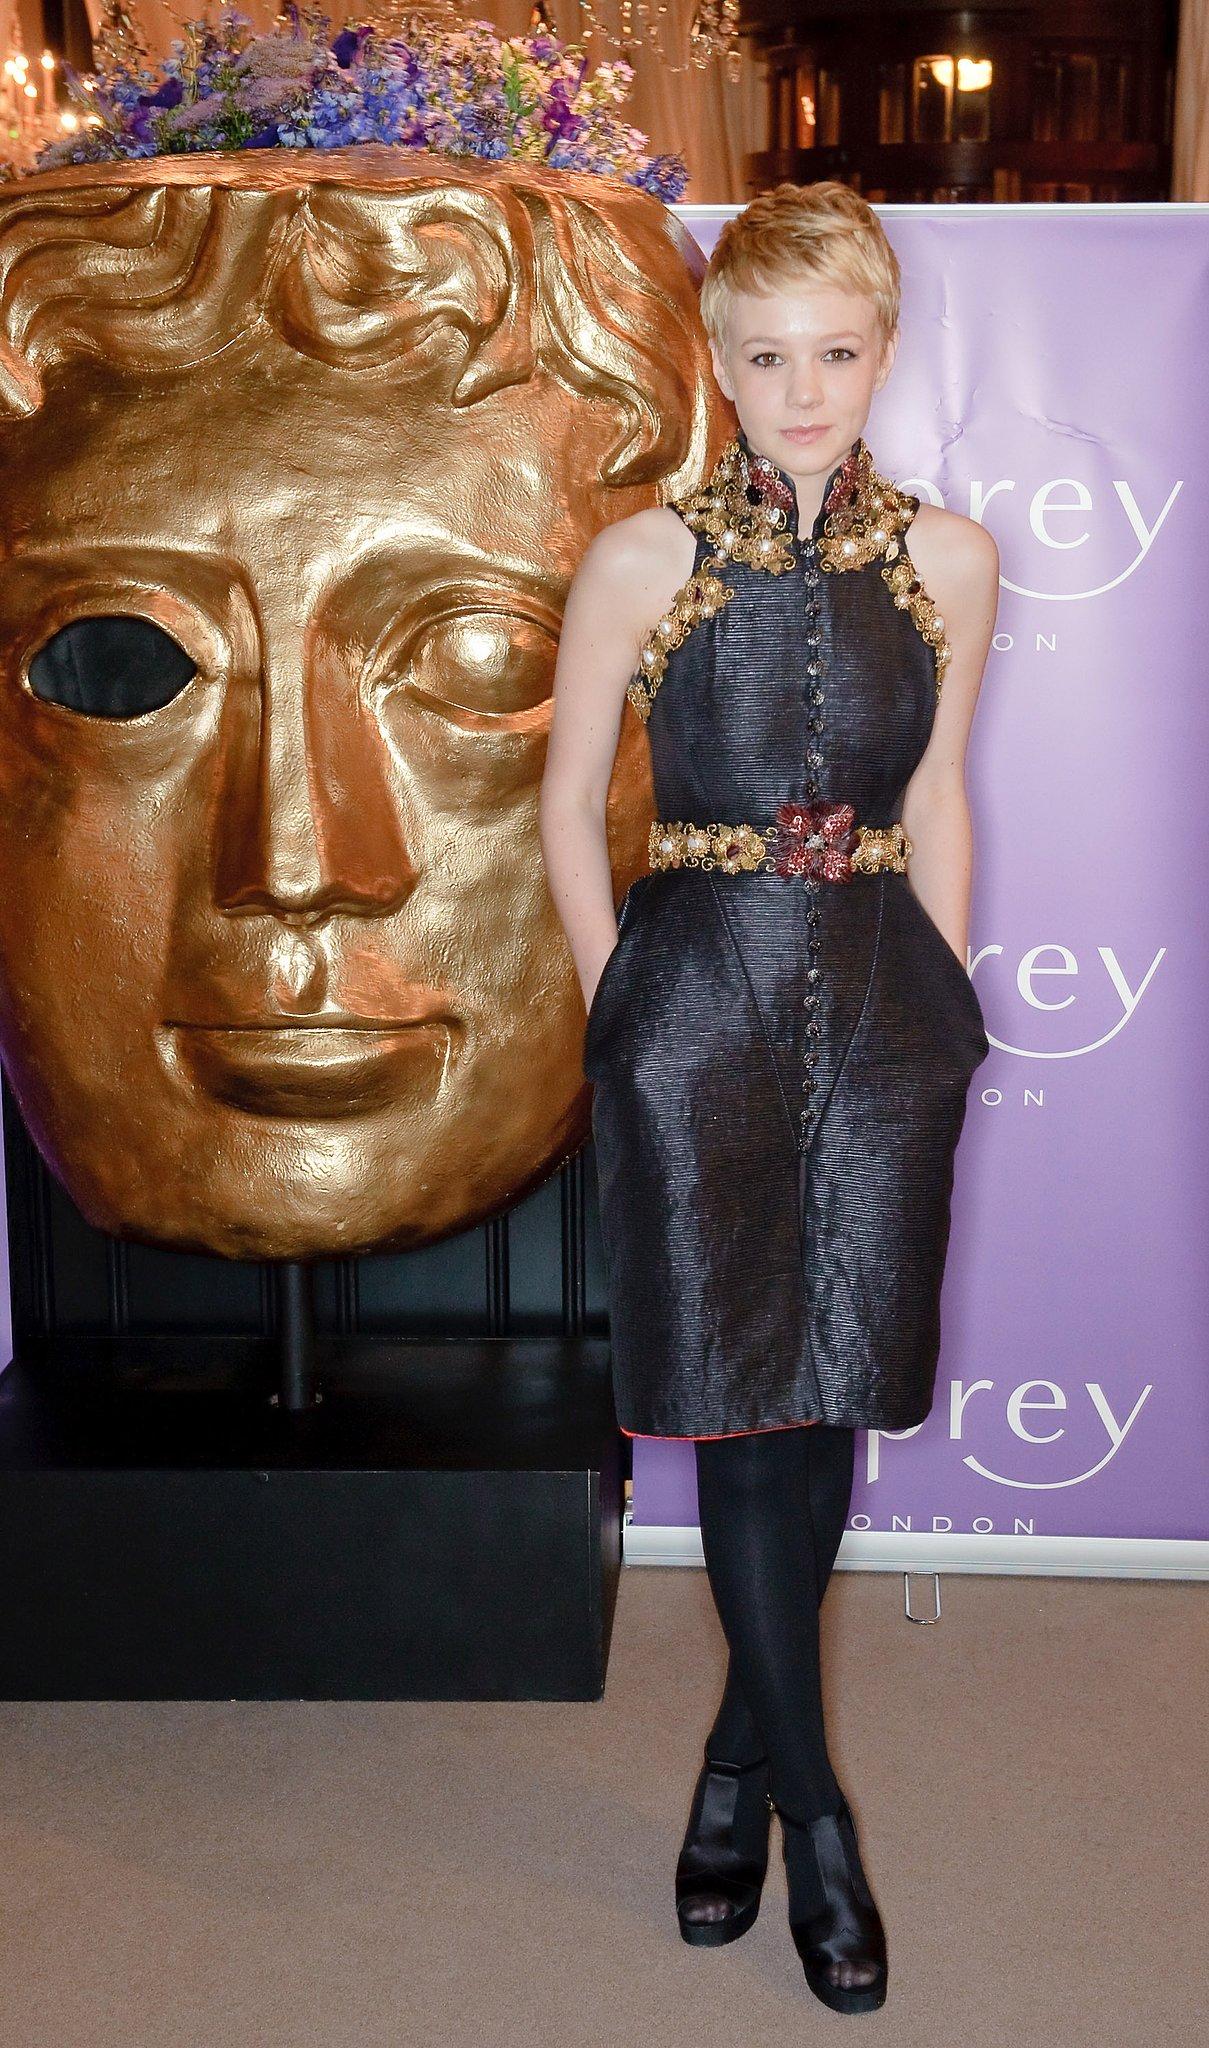 Carey Mulligan in Chanel at the 2010 Orange British Academy Film Awards